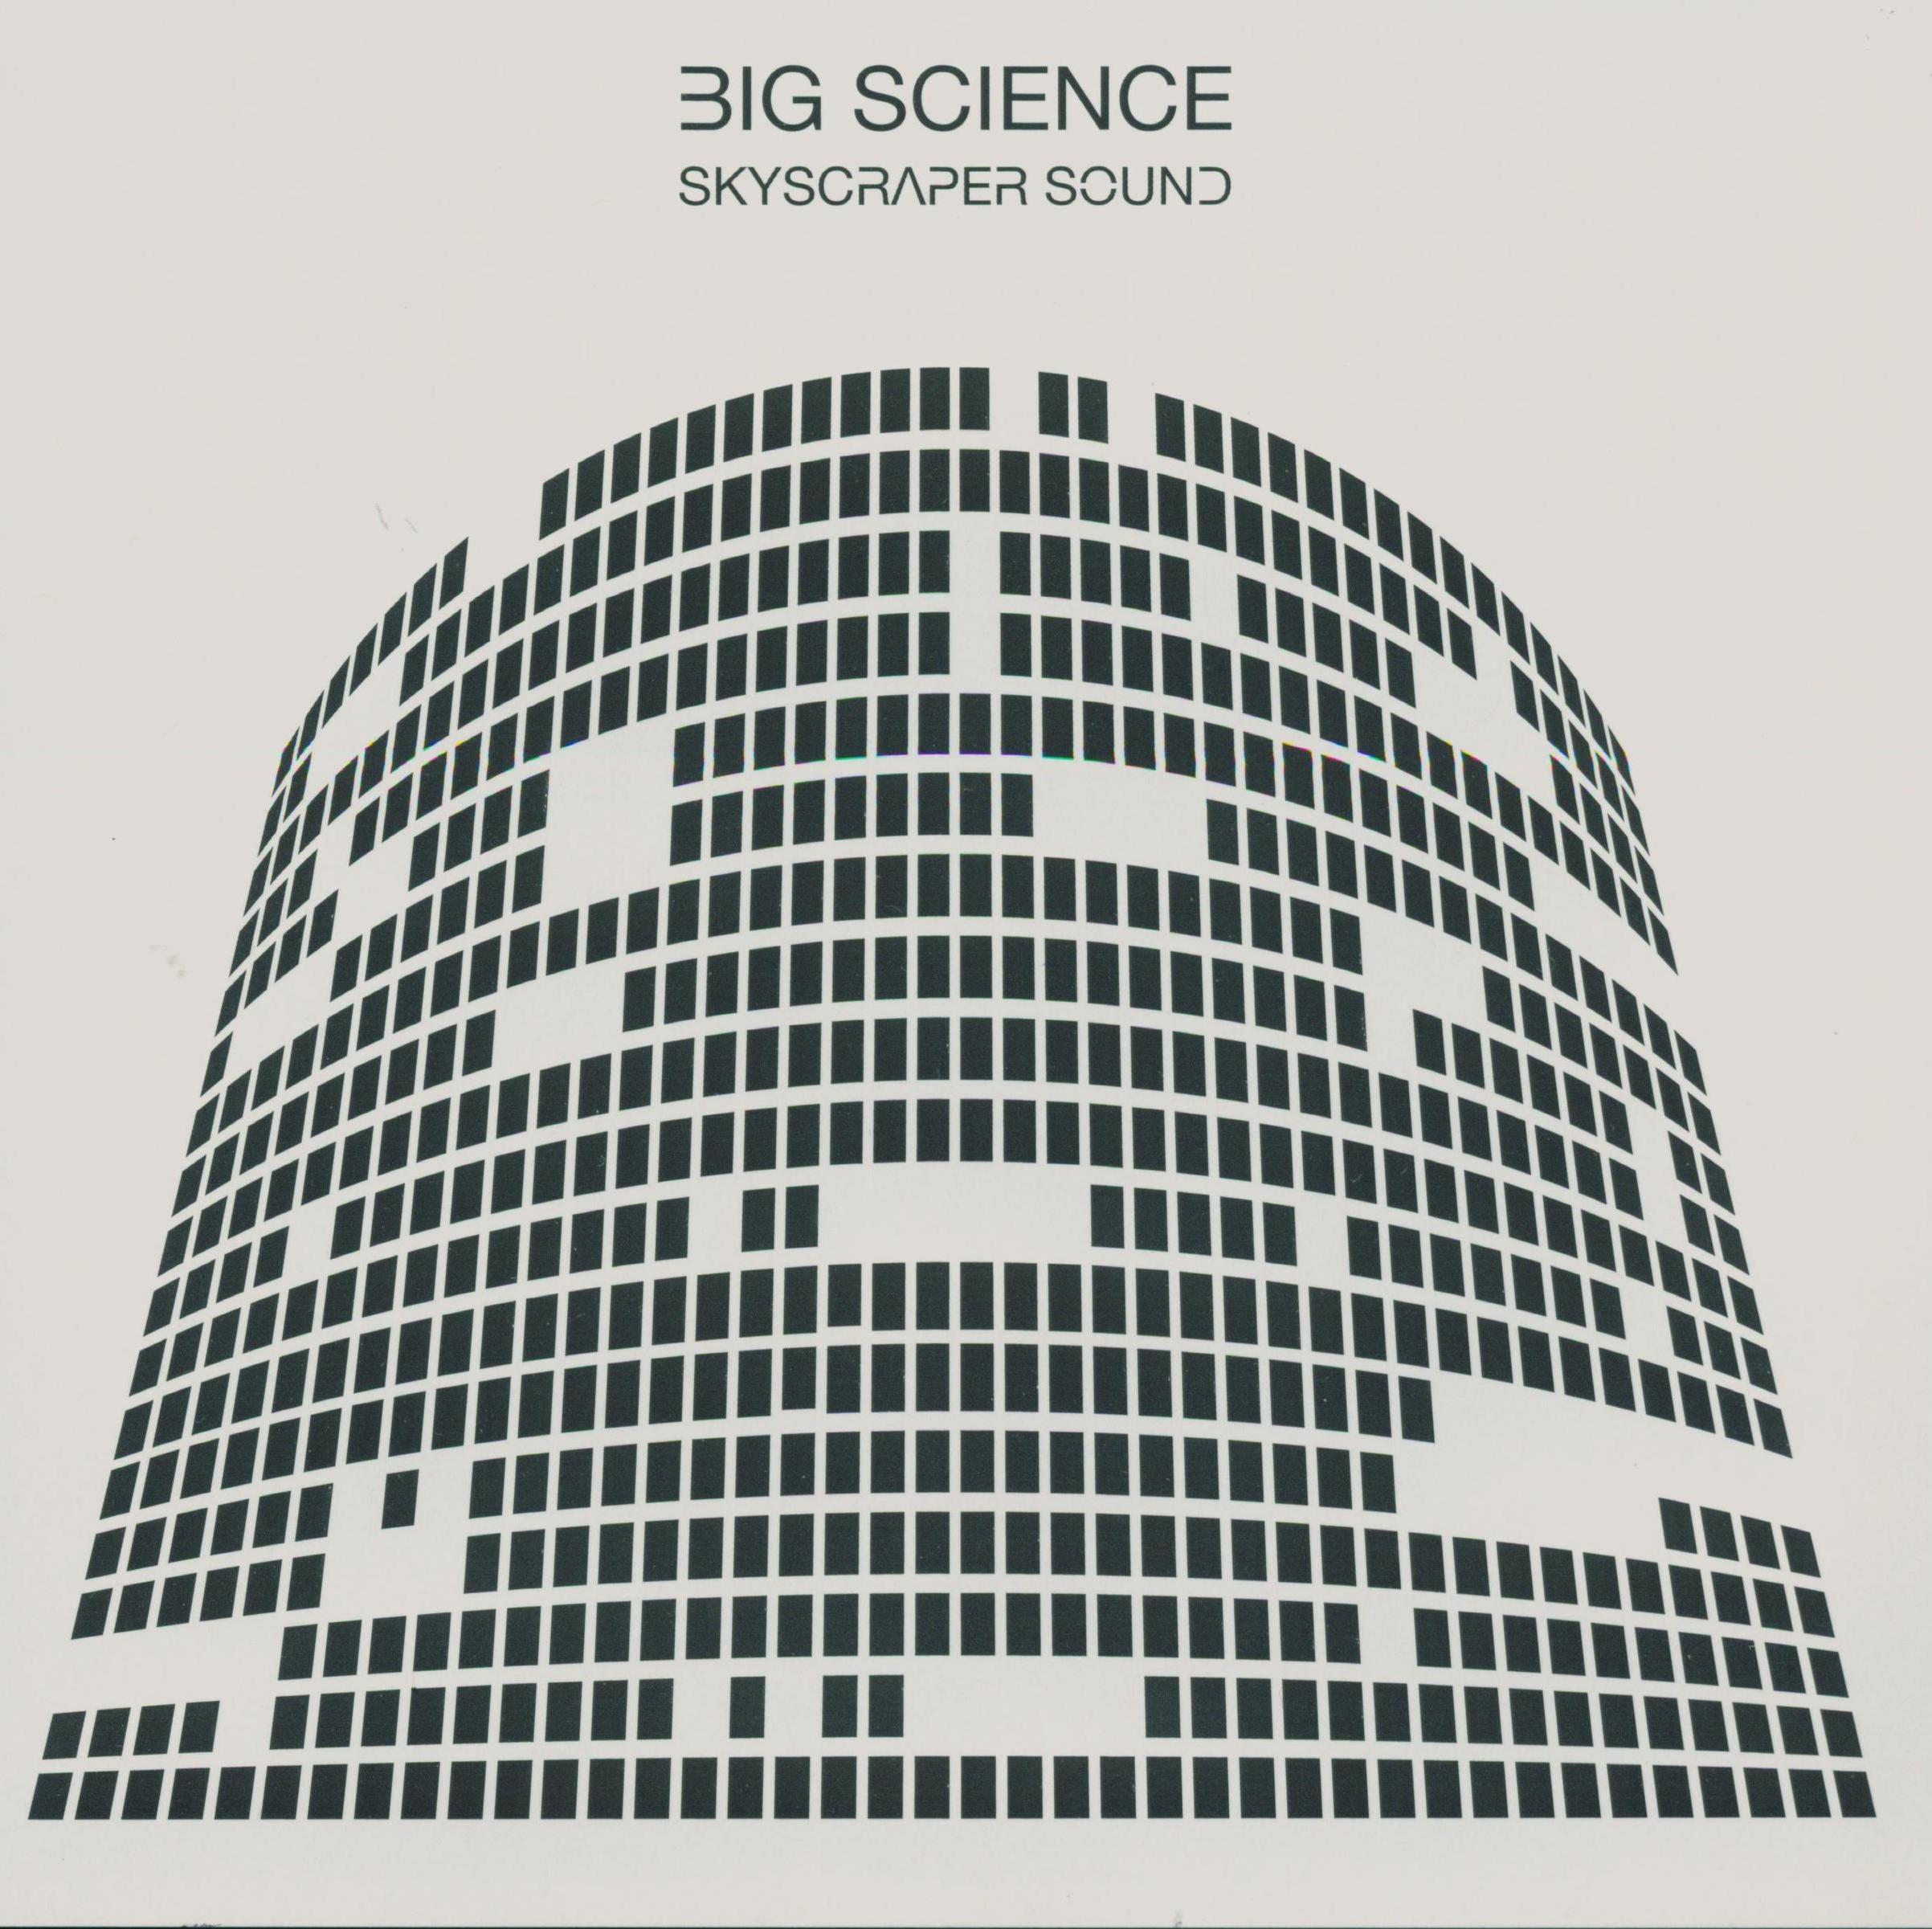 Big Science Skyscraper Sounds Album Artwork